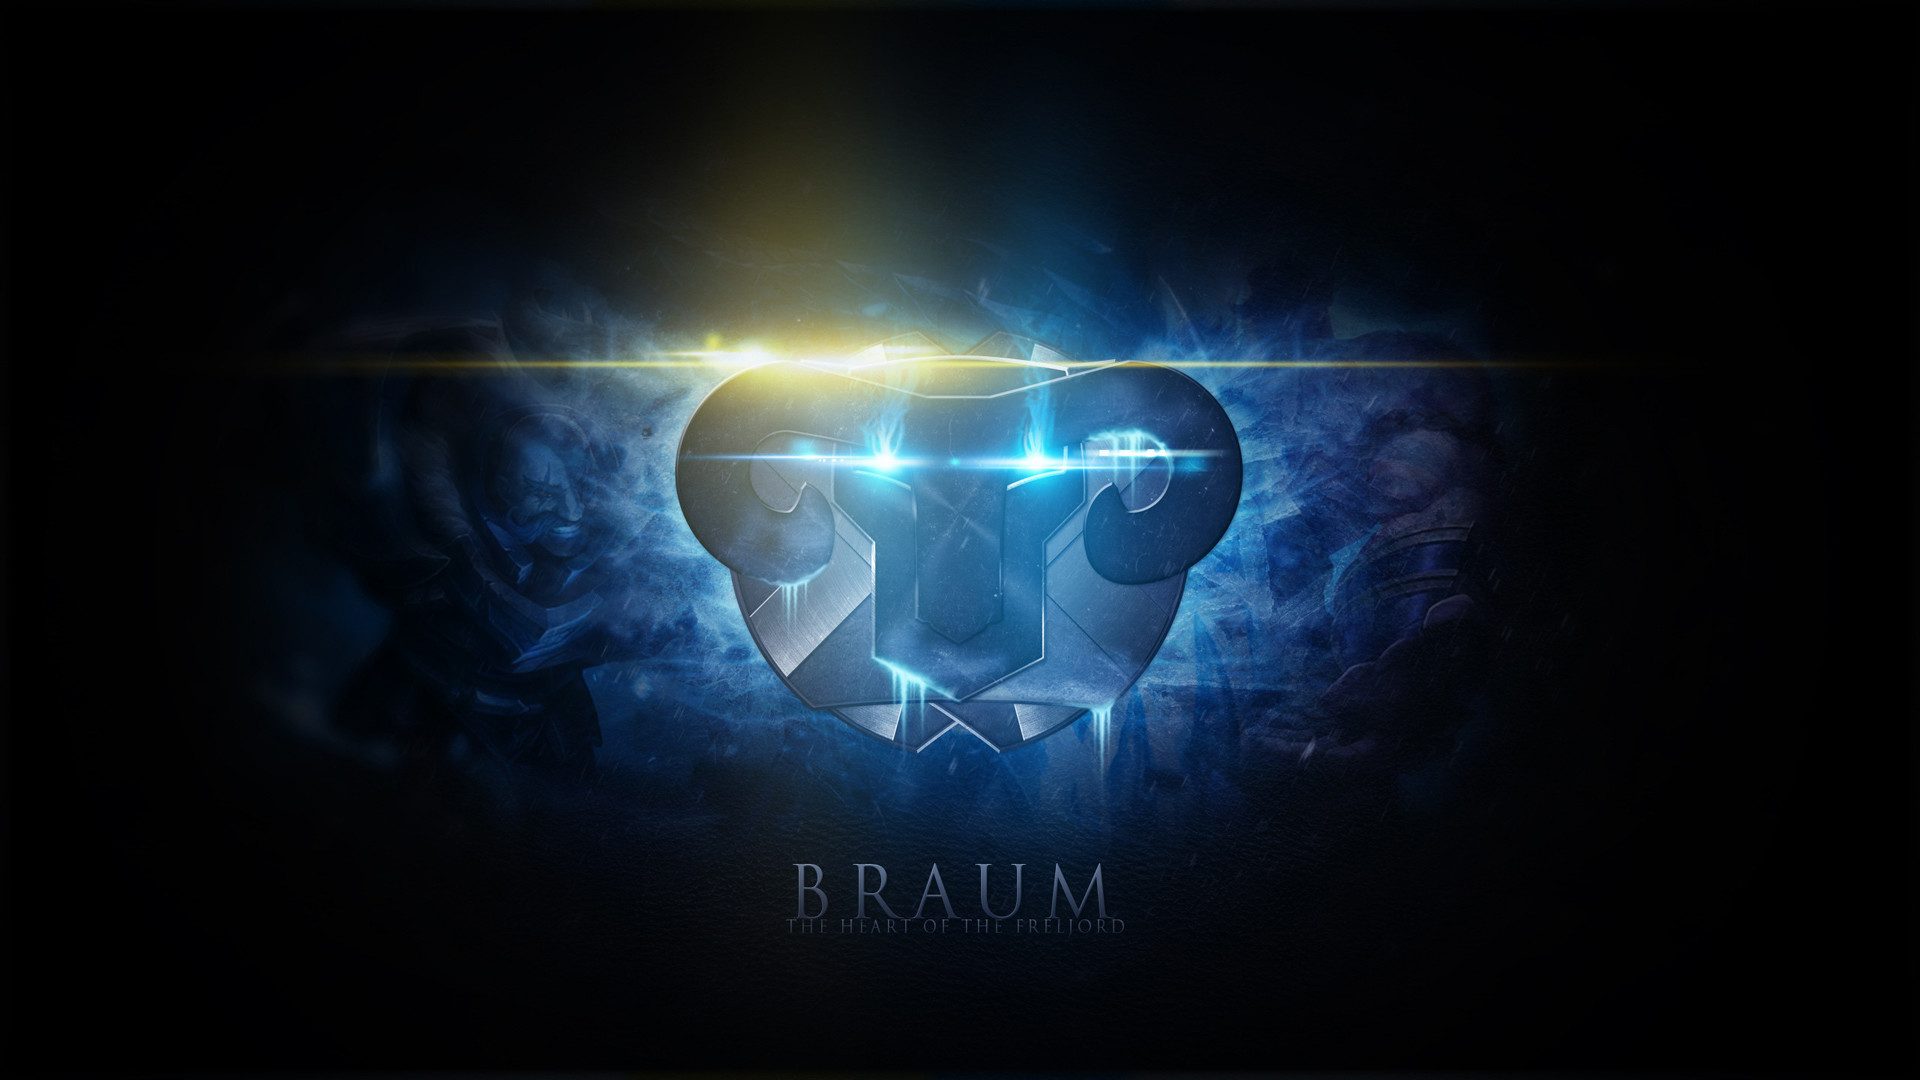 Braum logo icon League of Legends